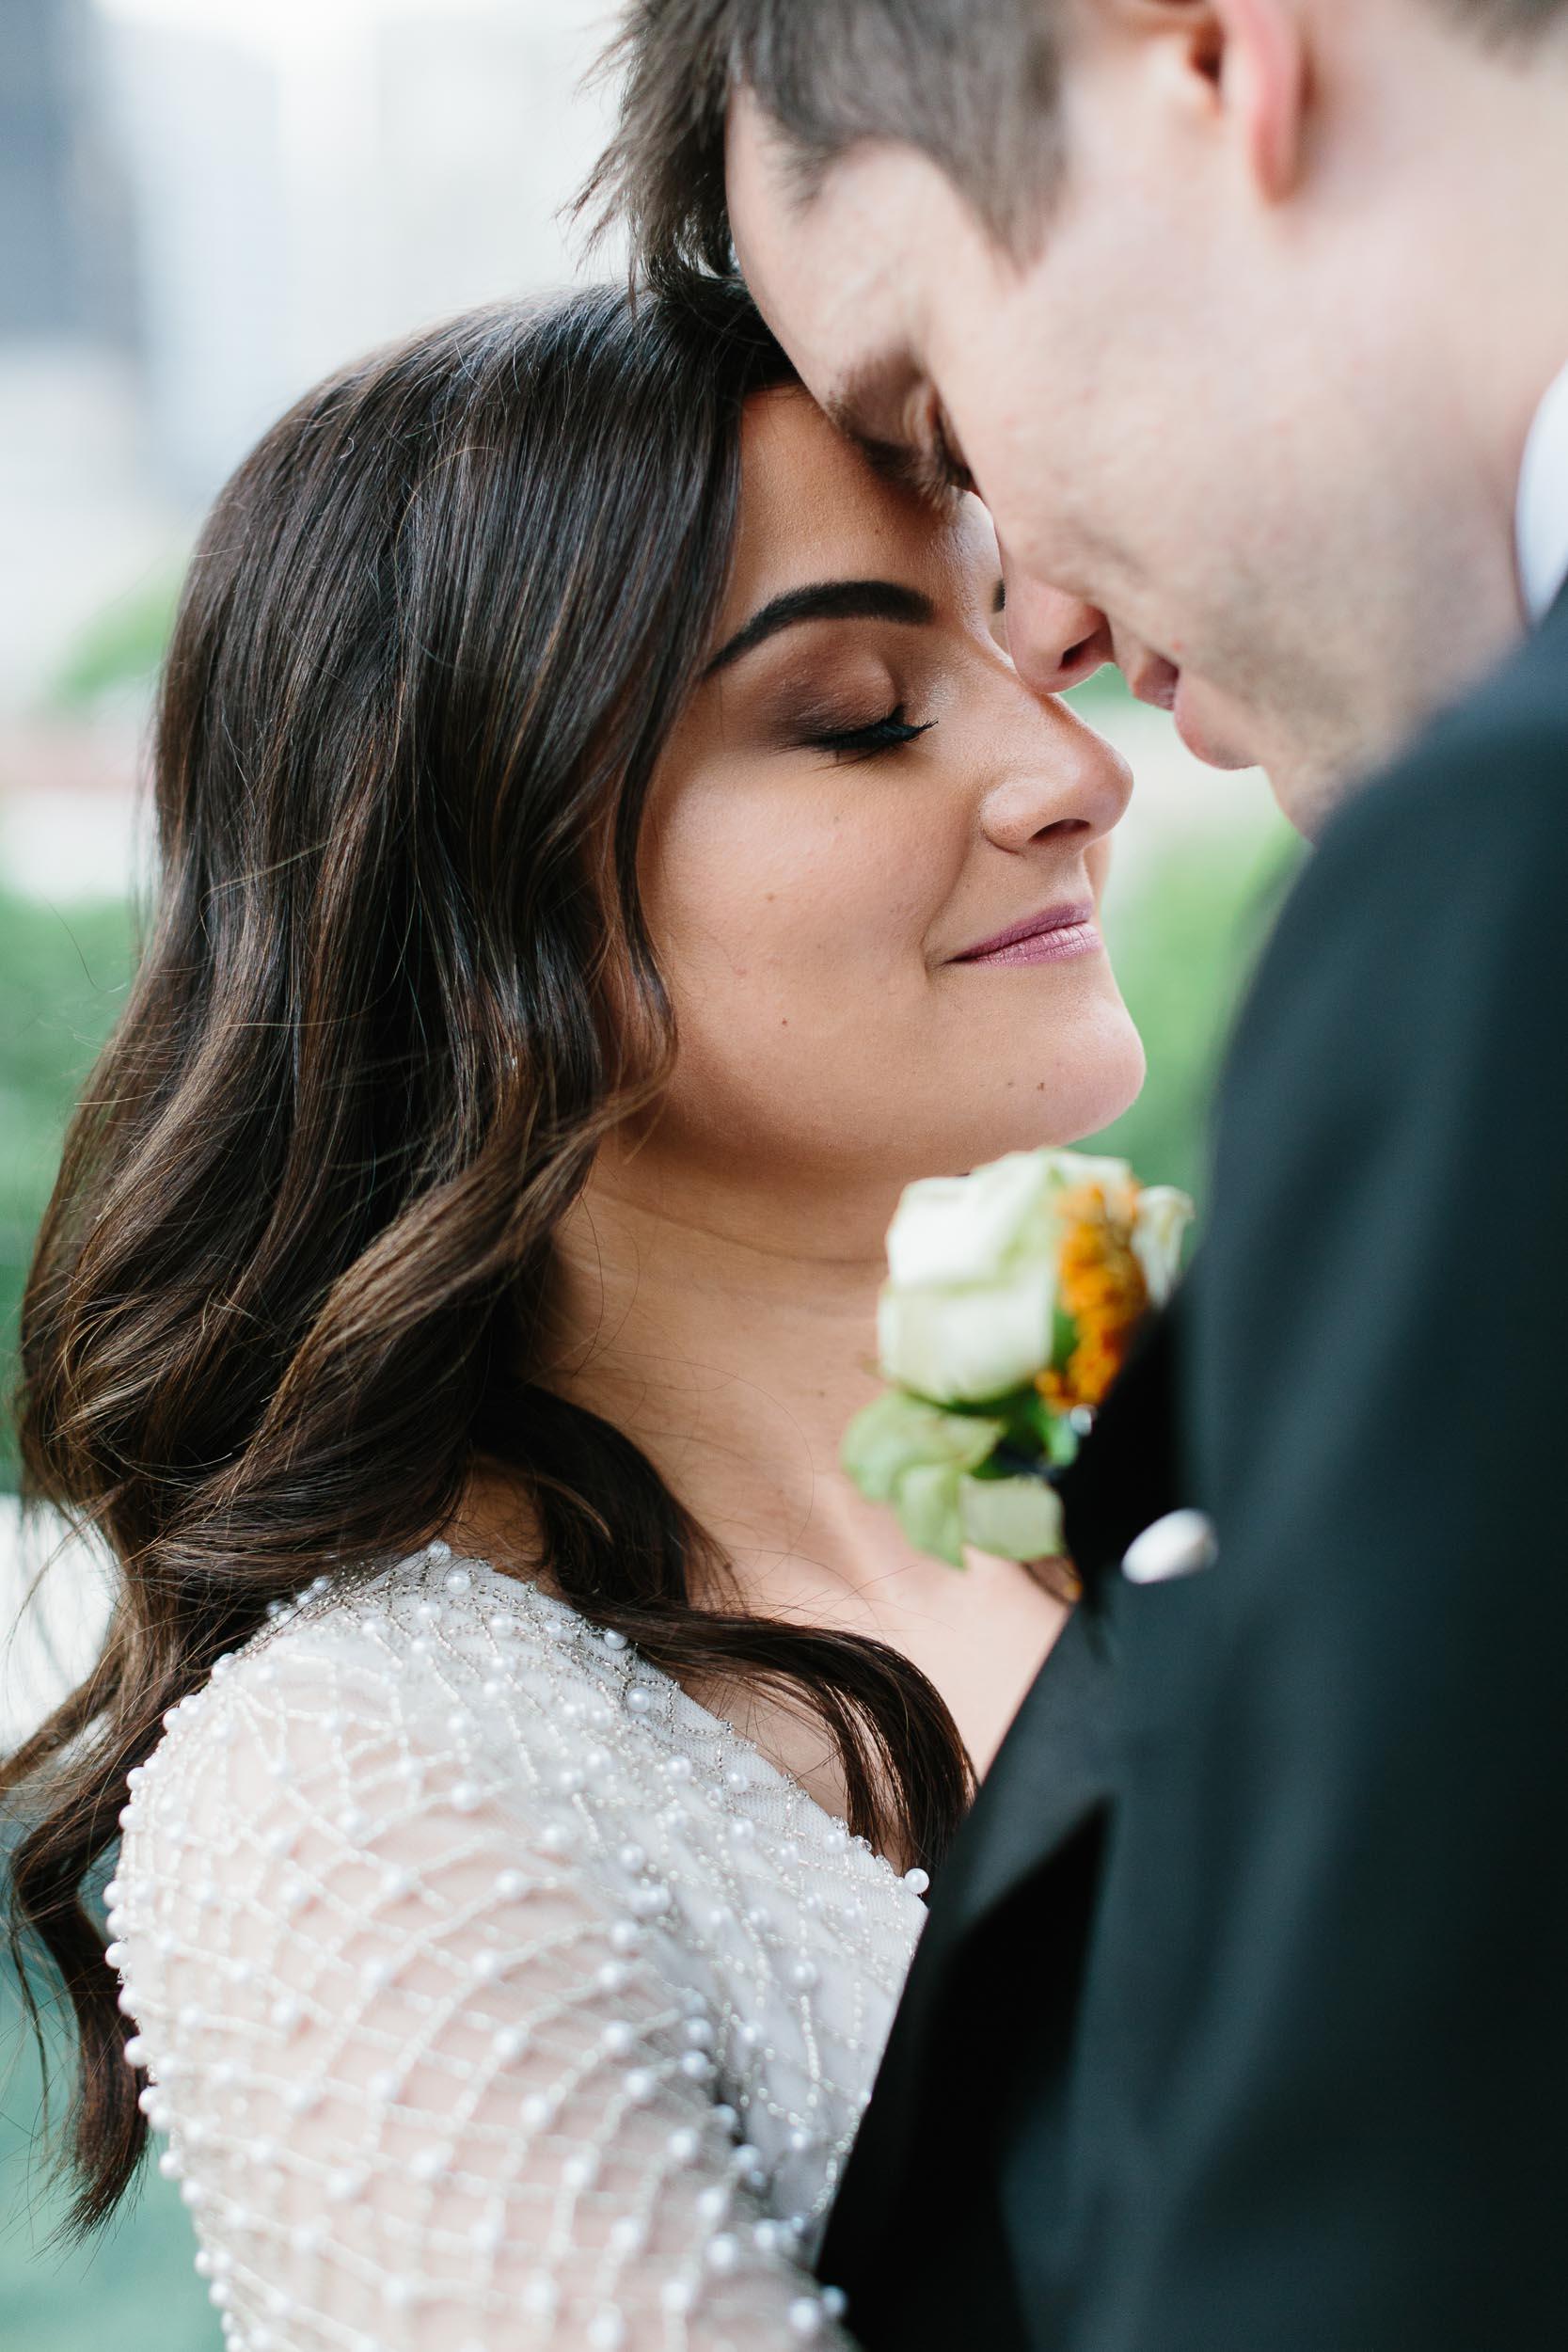 Kas-Richards-Wedding-Photographer-Melbourne-City-Wedding-Alto-Event-Space-Jane-Hill-Bridal-Gown-61.jpg